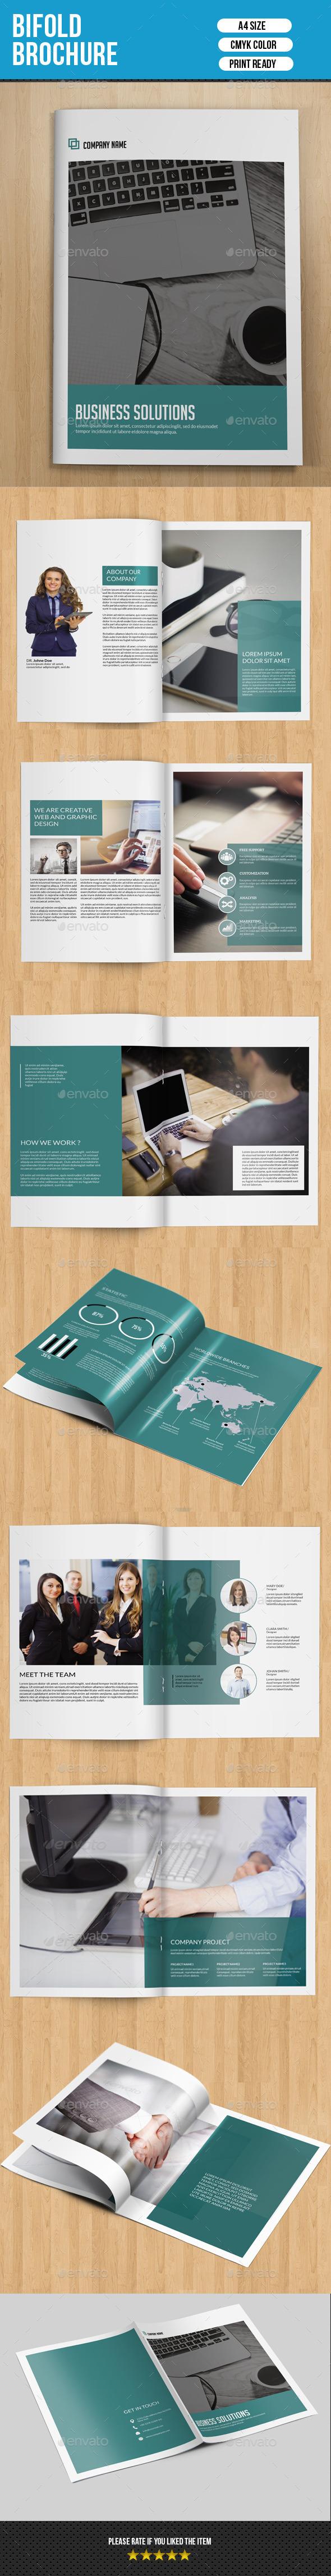 Corporate Brochure Template-V211 - Corporate Brochures